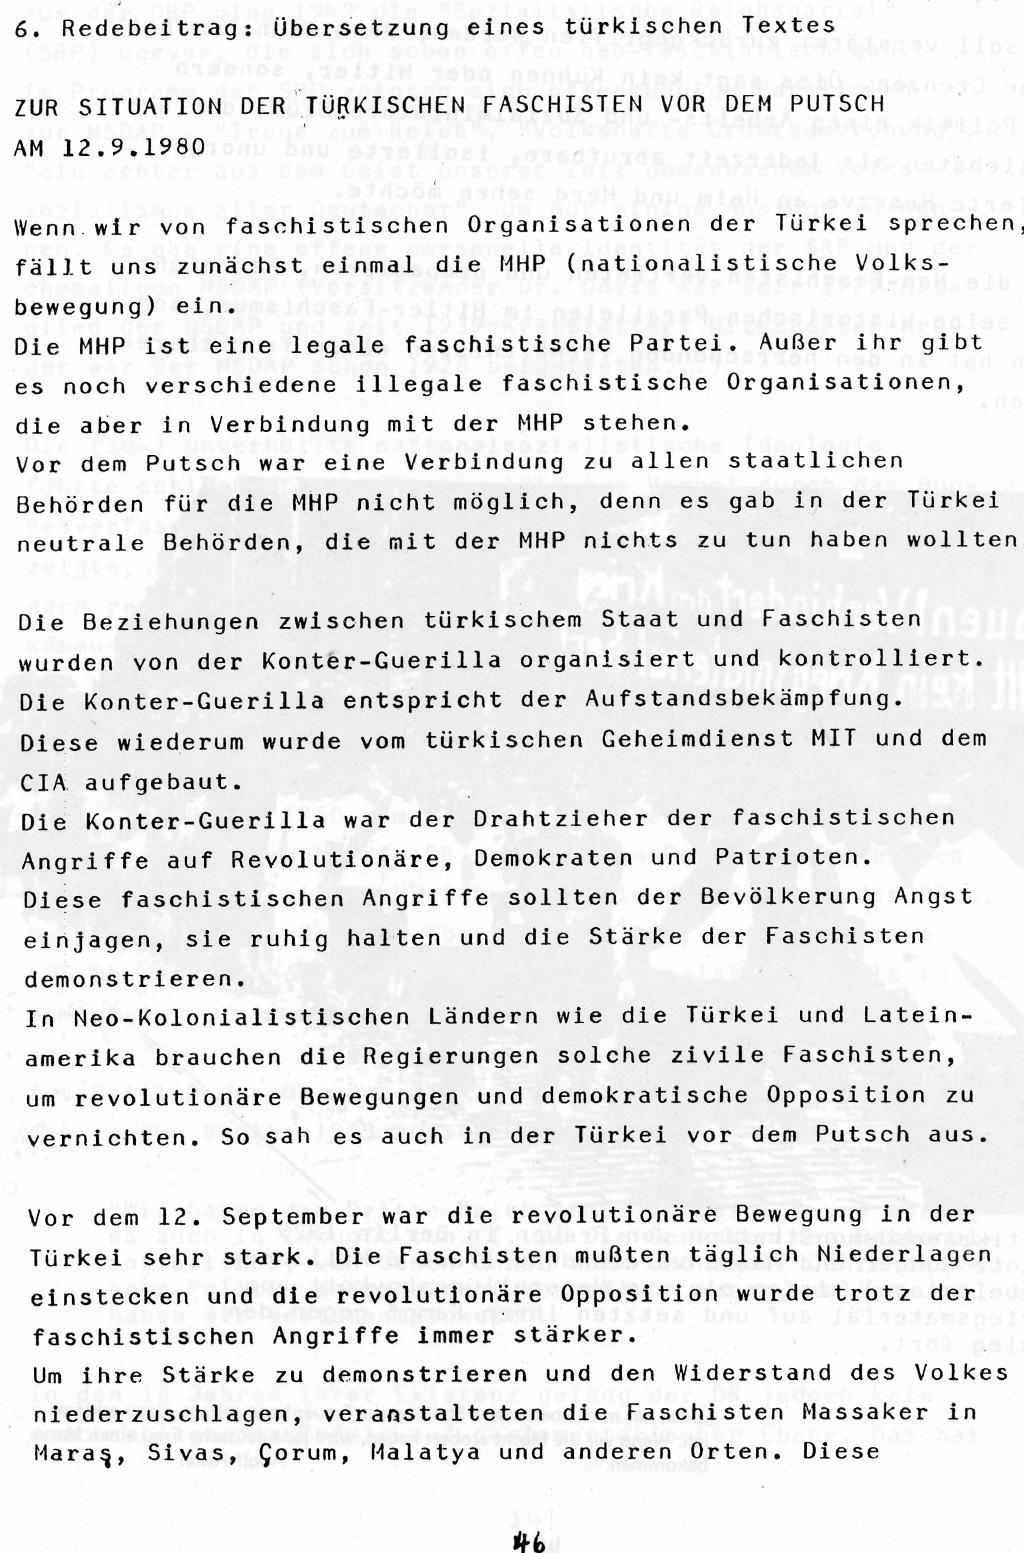 Berlin_1983_Autonome_Gruppen_Faschismus_im_Kapitalismus_46